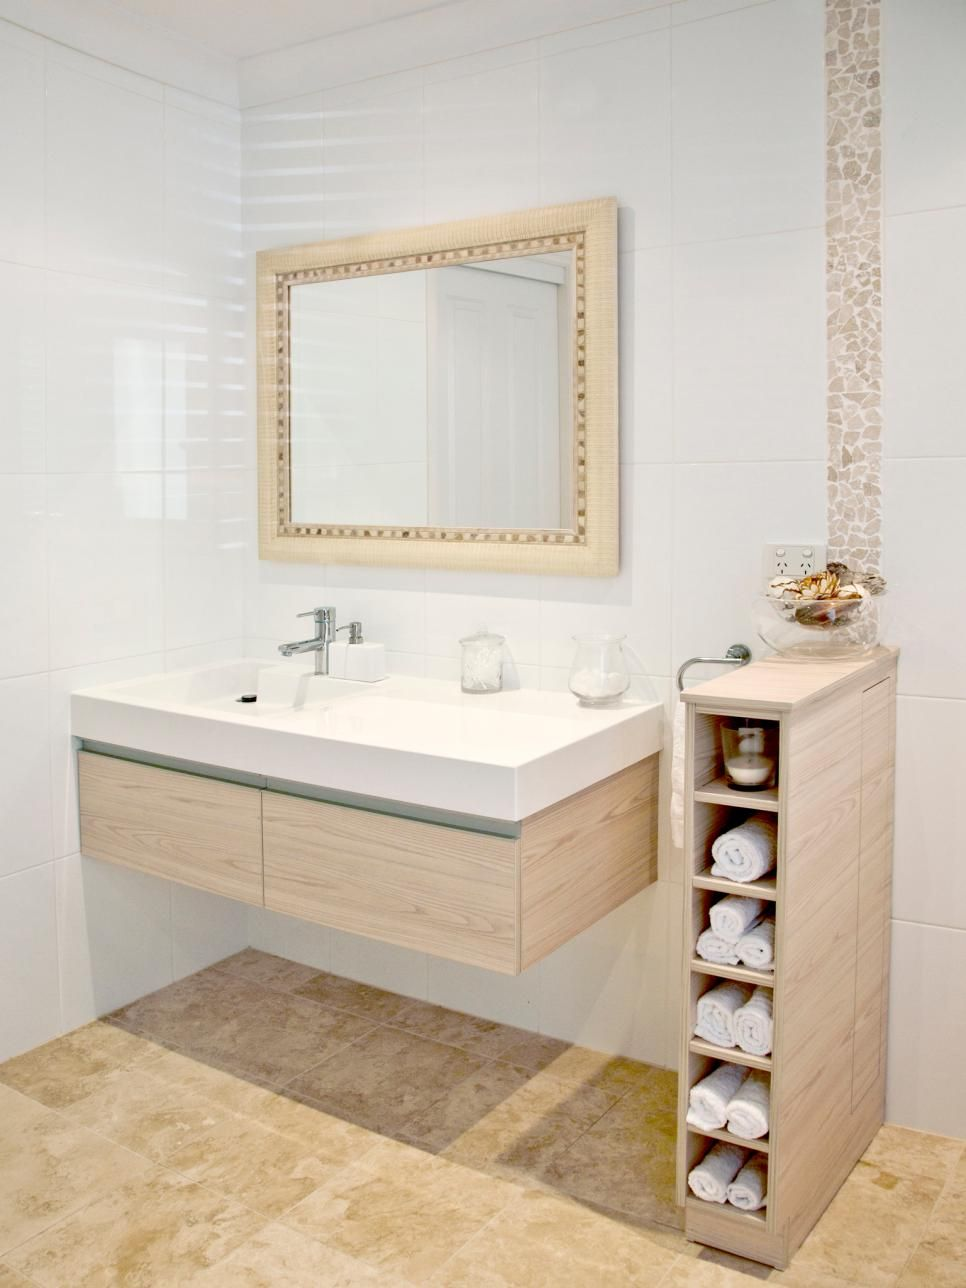 15 smart bath storage ideas bath pinterest feature tiles bath rh pinterest co uk